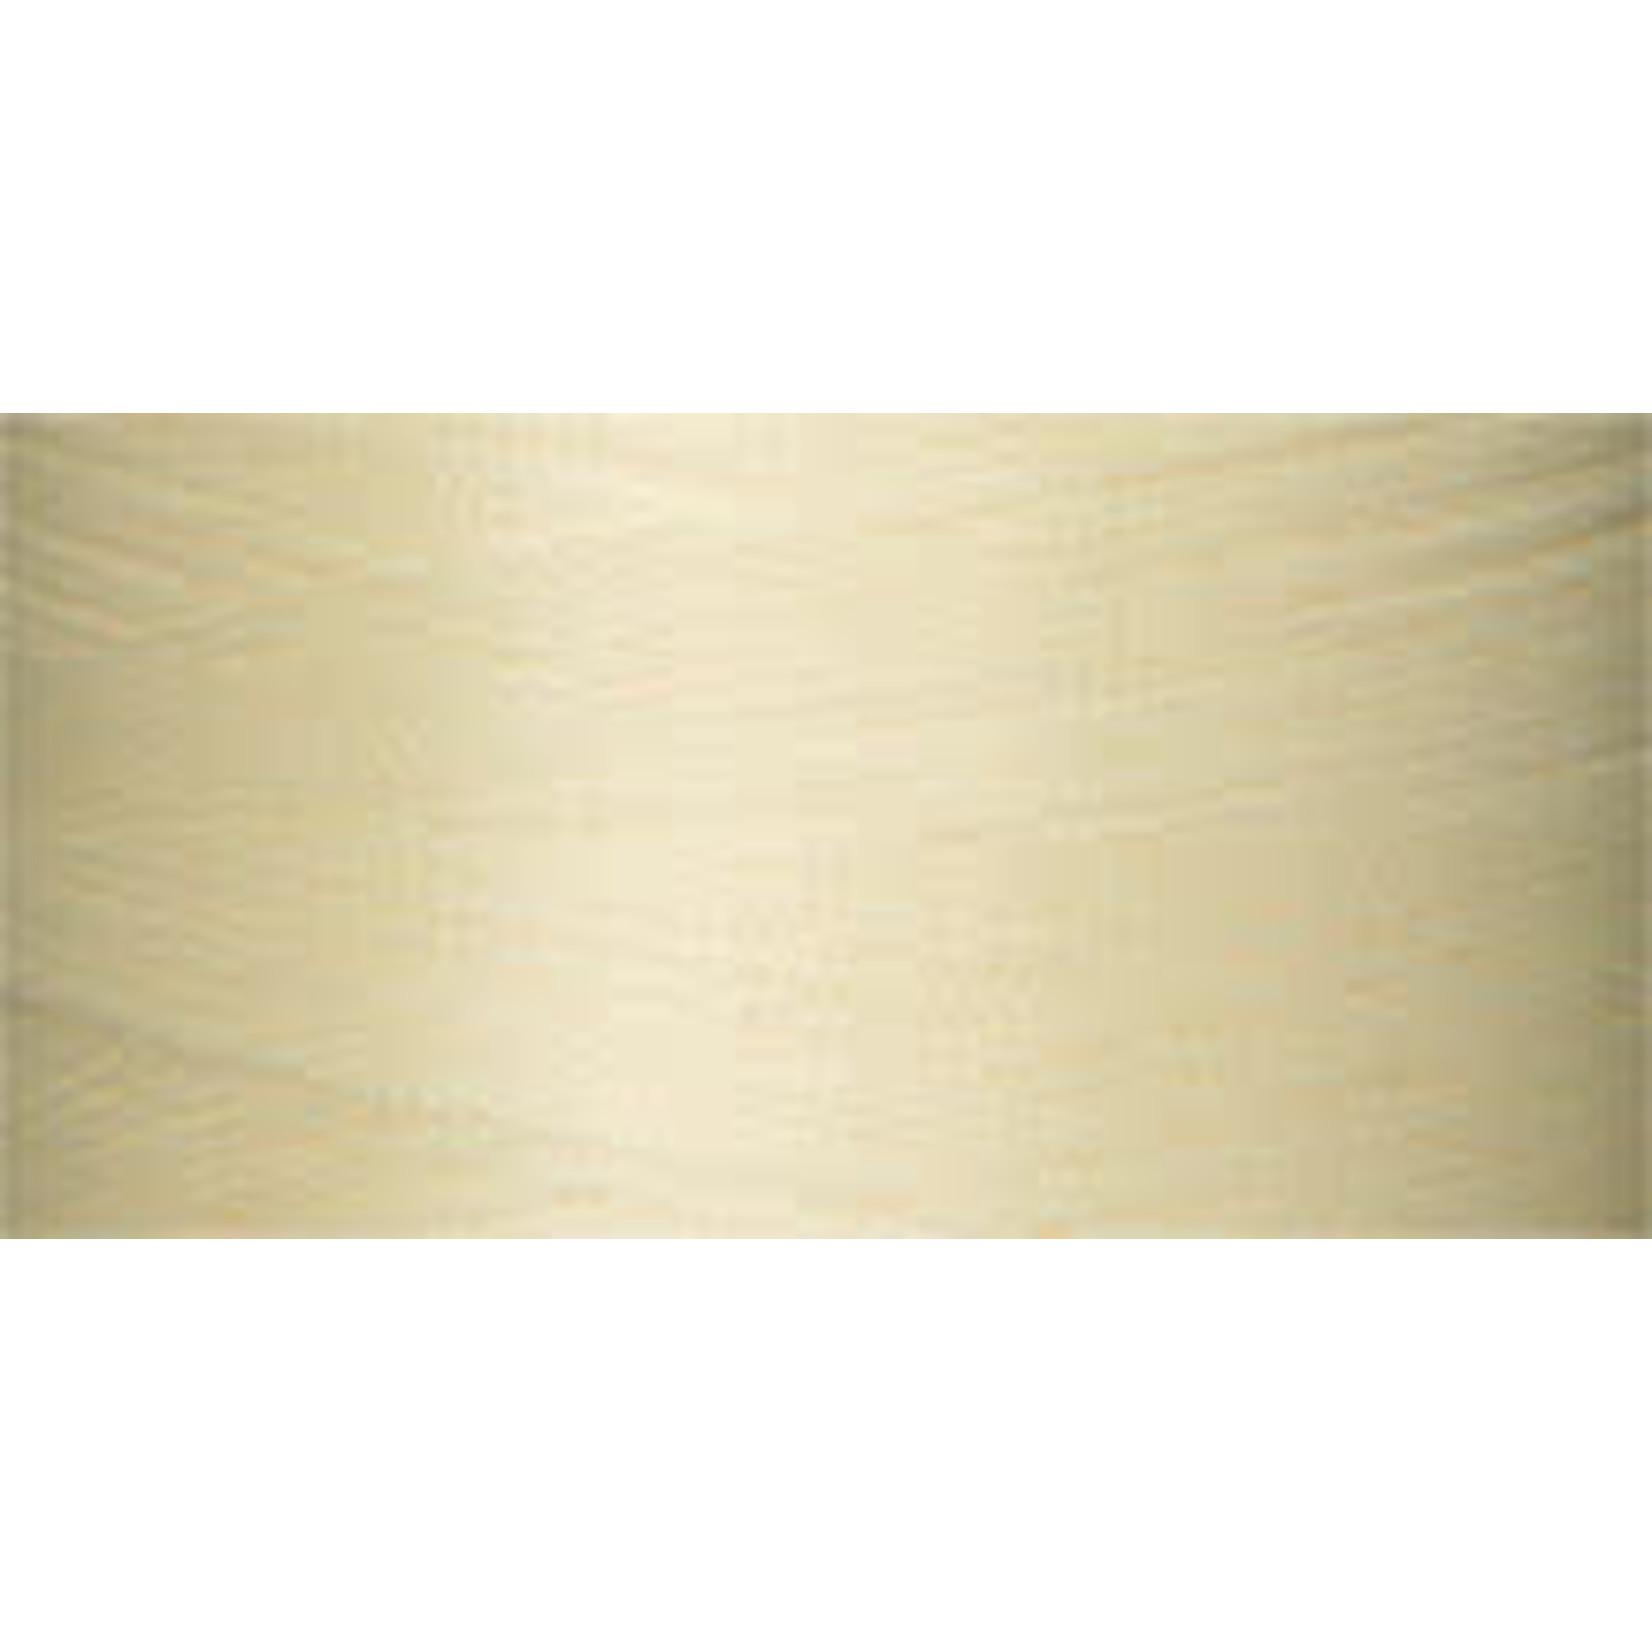 Superior Threads Bottom Line - #60 - 1300 m - 640 Light Yellow